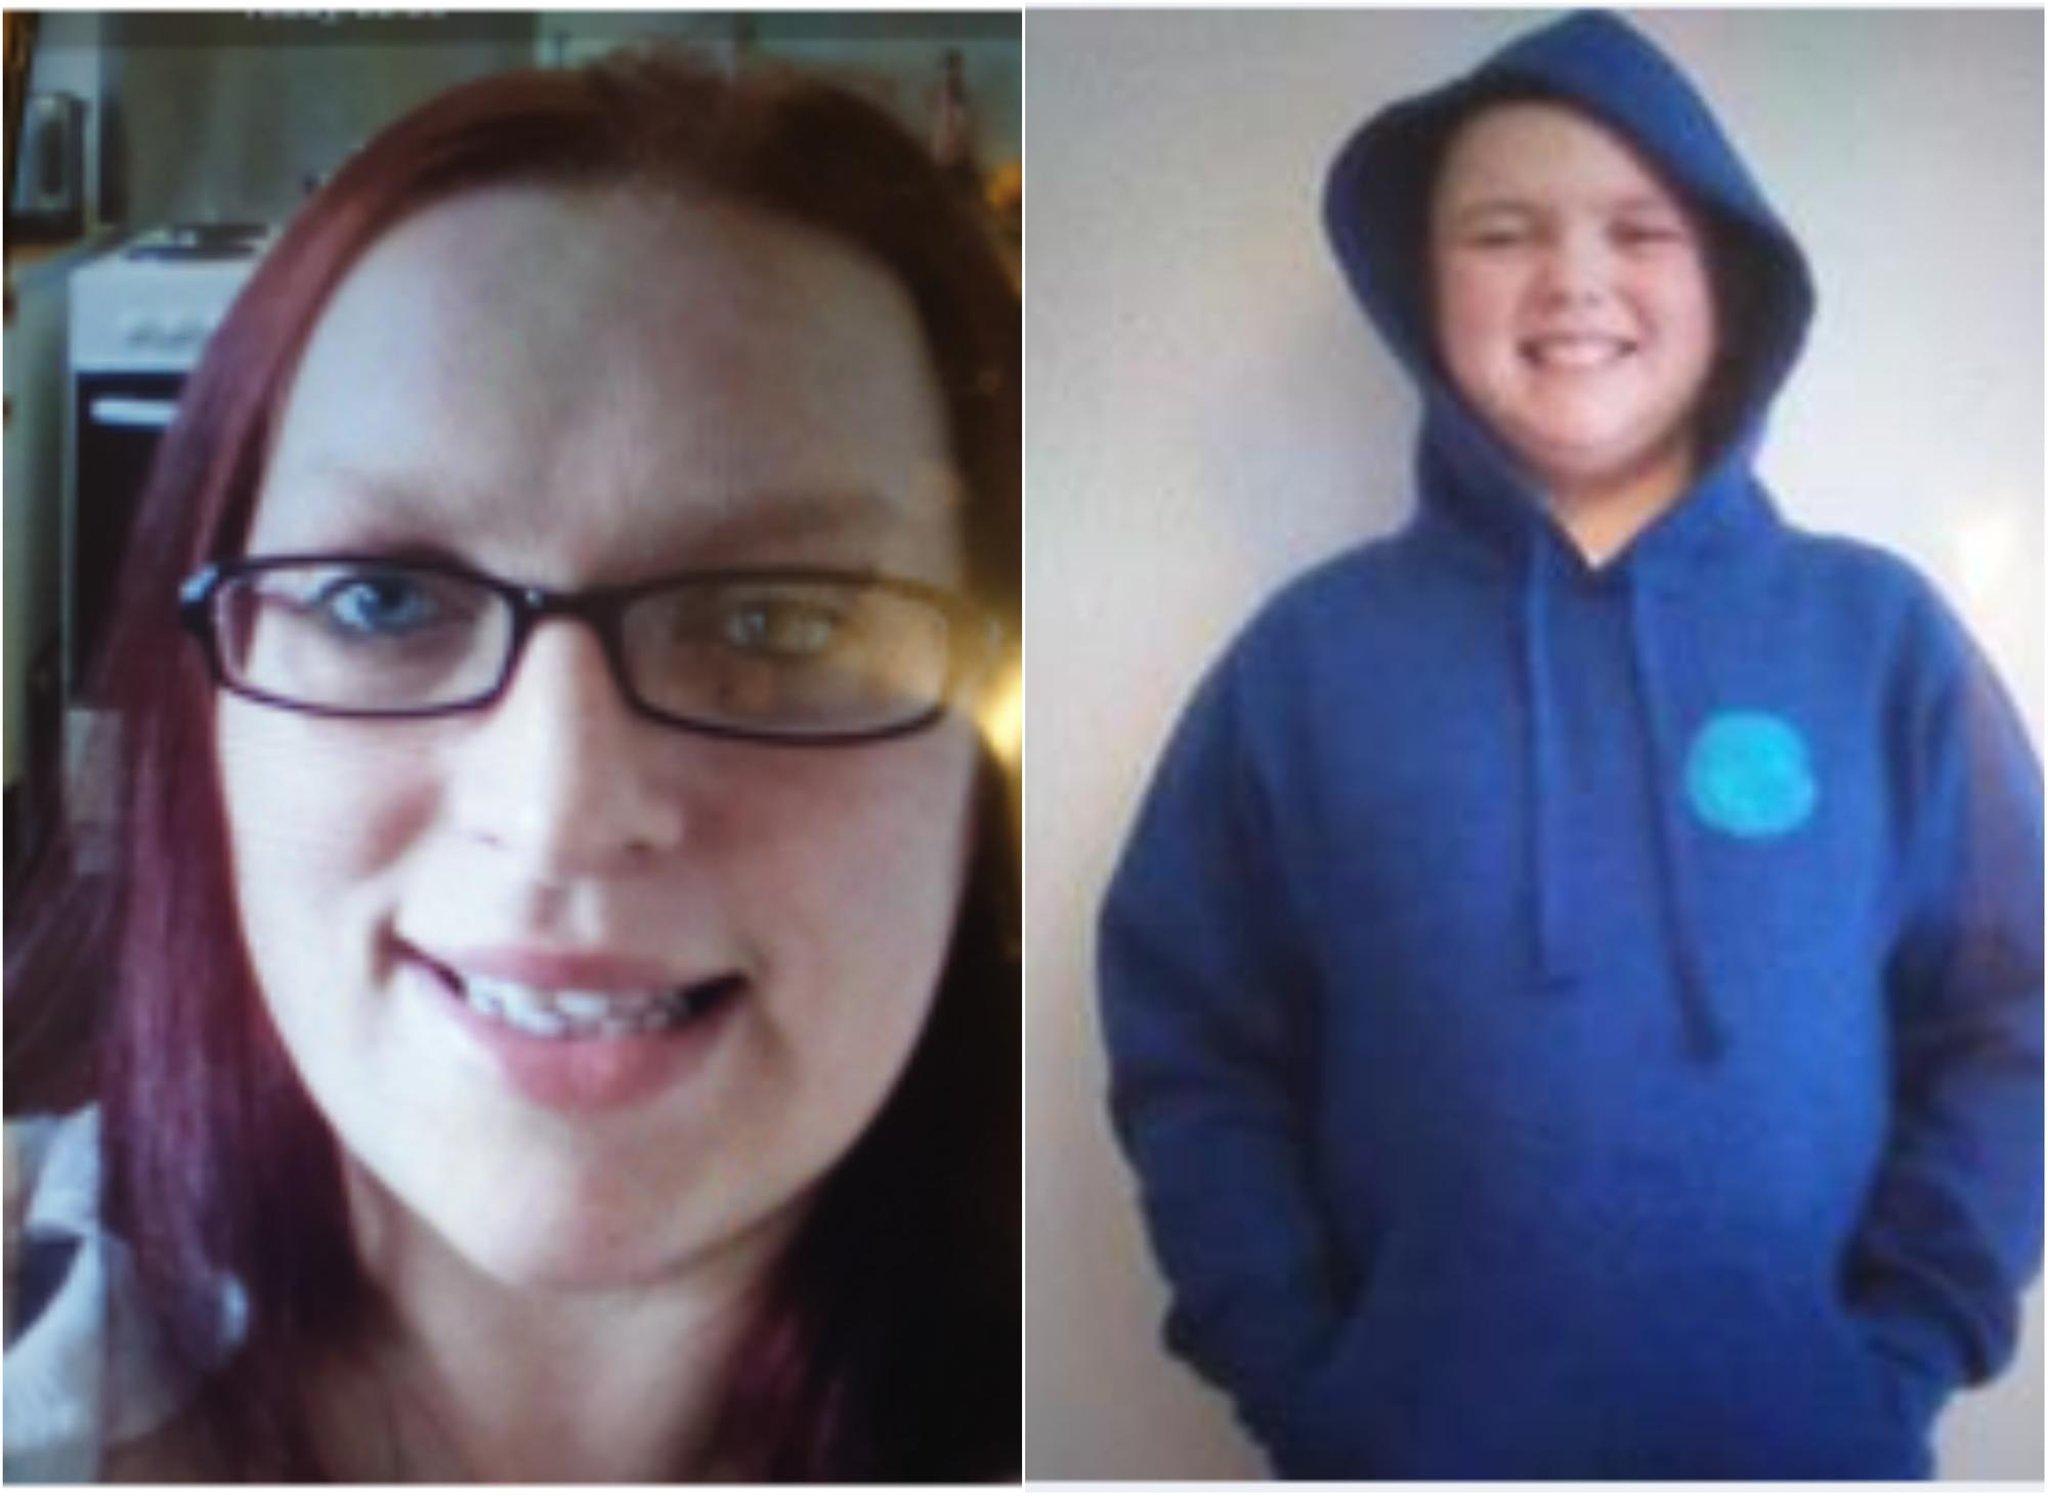 Linda Newlands dan Andrew Baird: Kekhawatiran muncul setelah ibu dan anak hilang dari daerah Dingwall